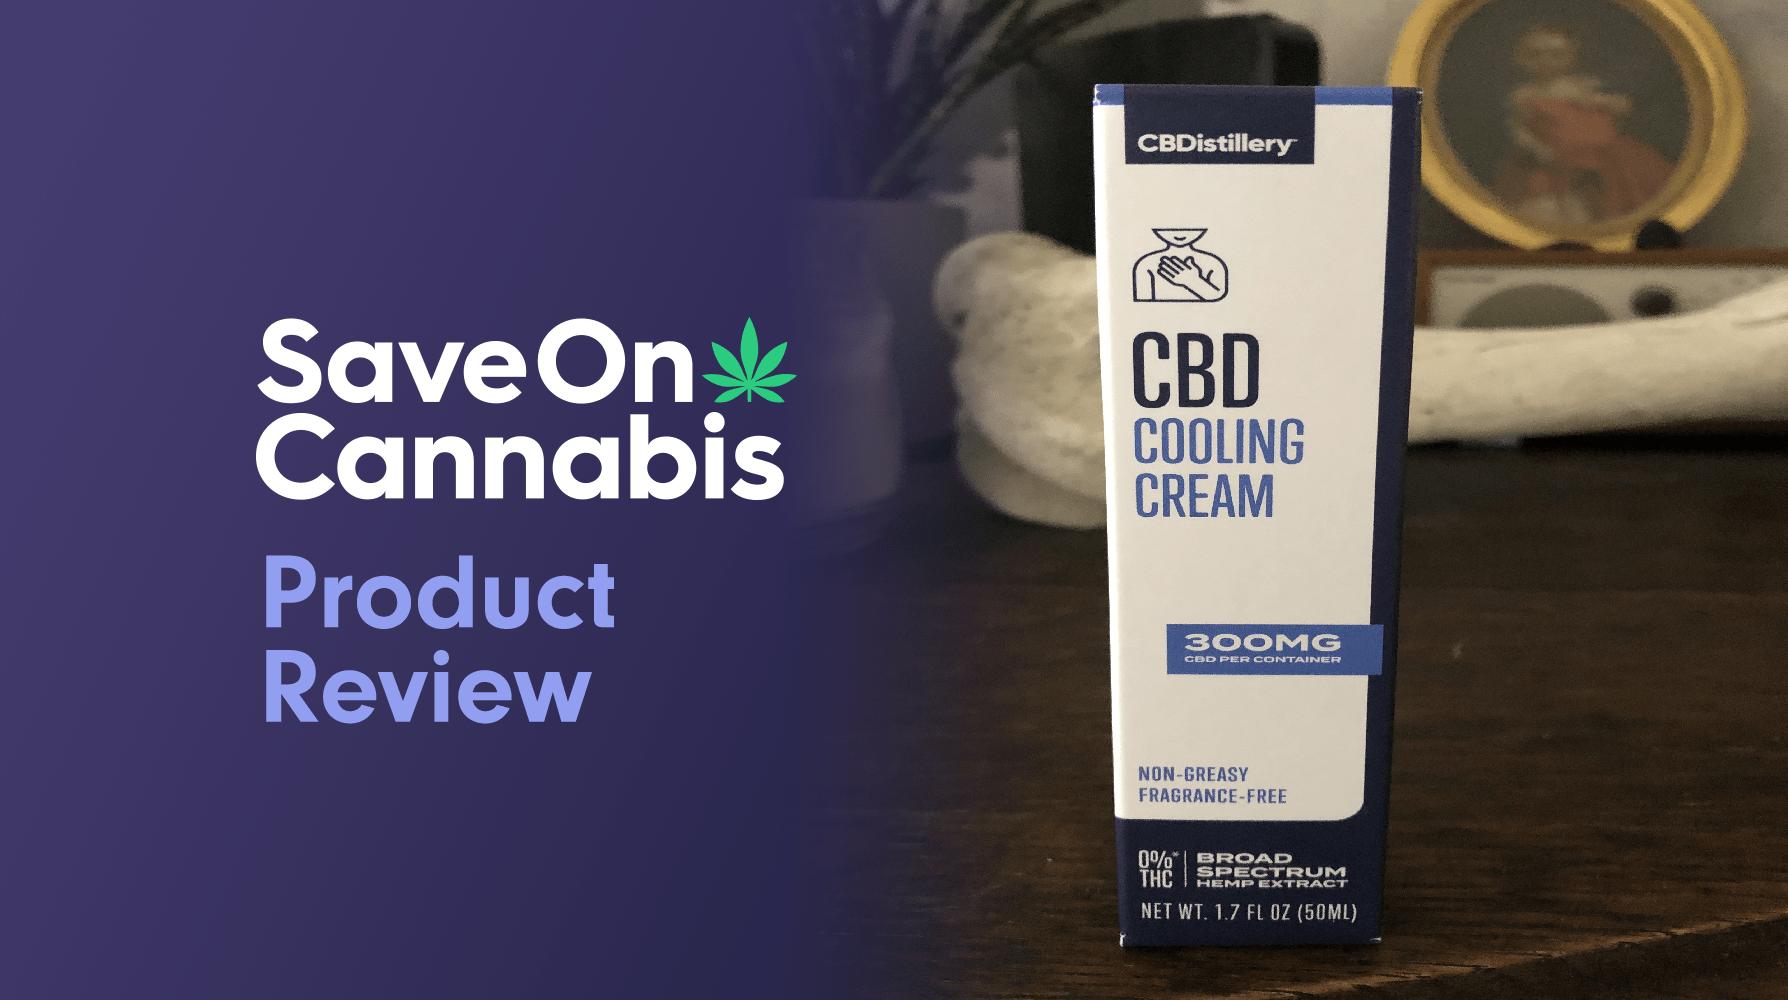 Cbdistillery CBD Cooling Cream Save On Cannabis Review Website